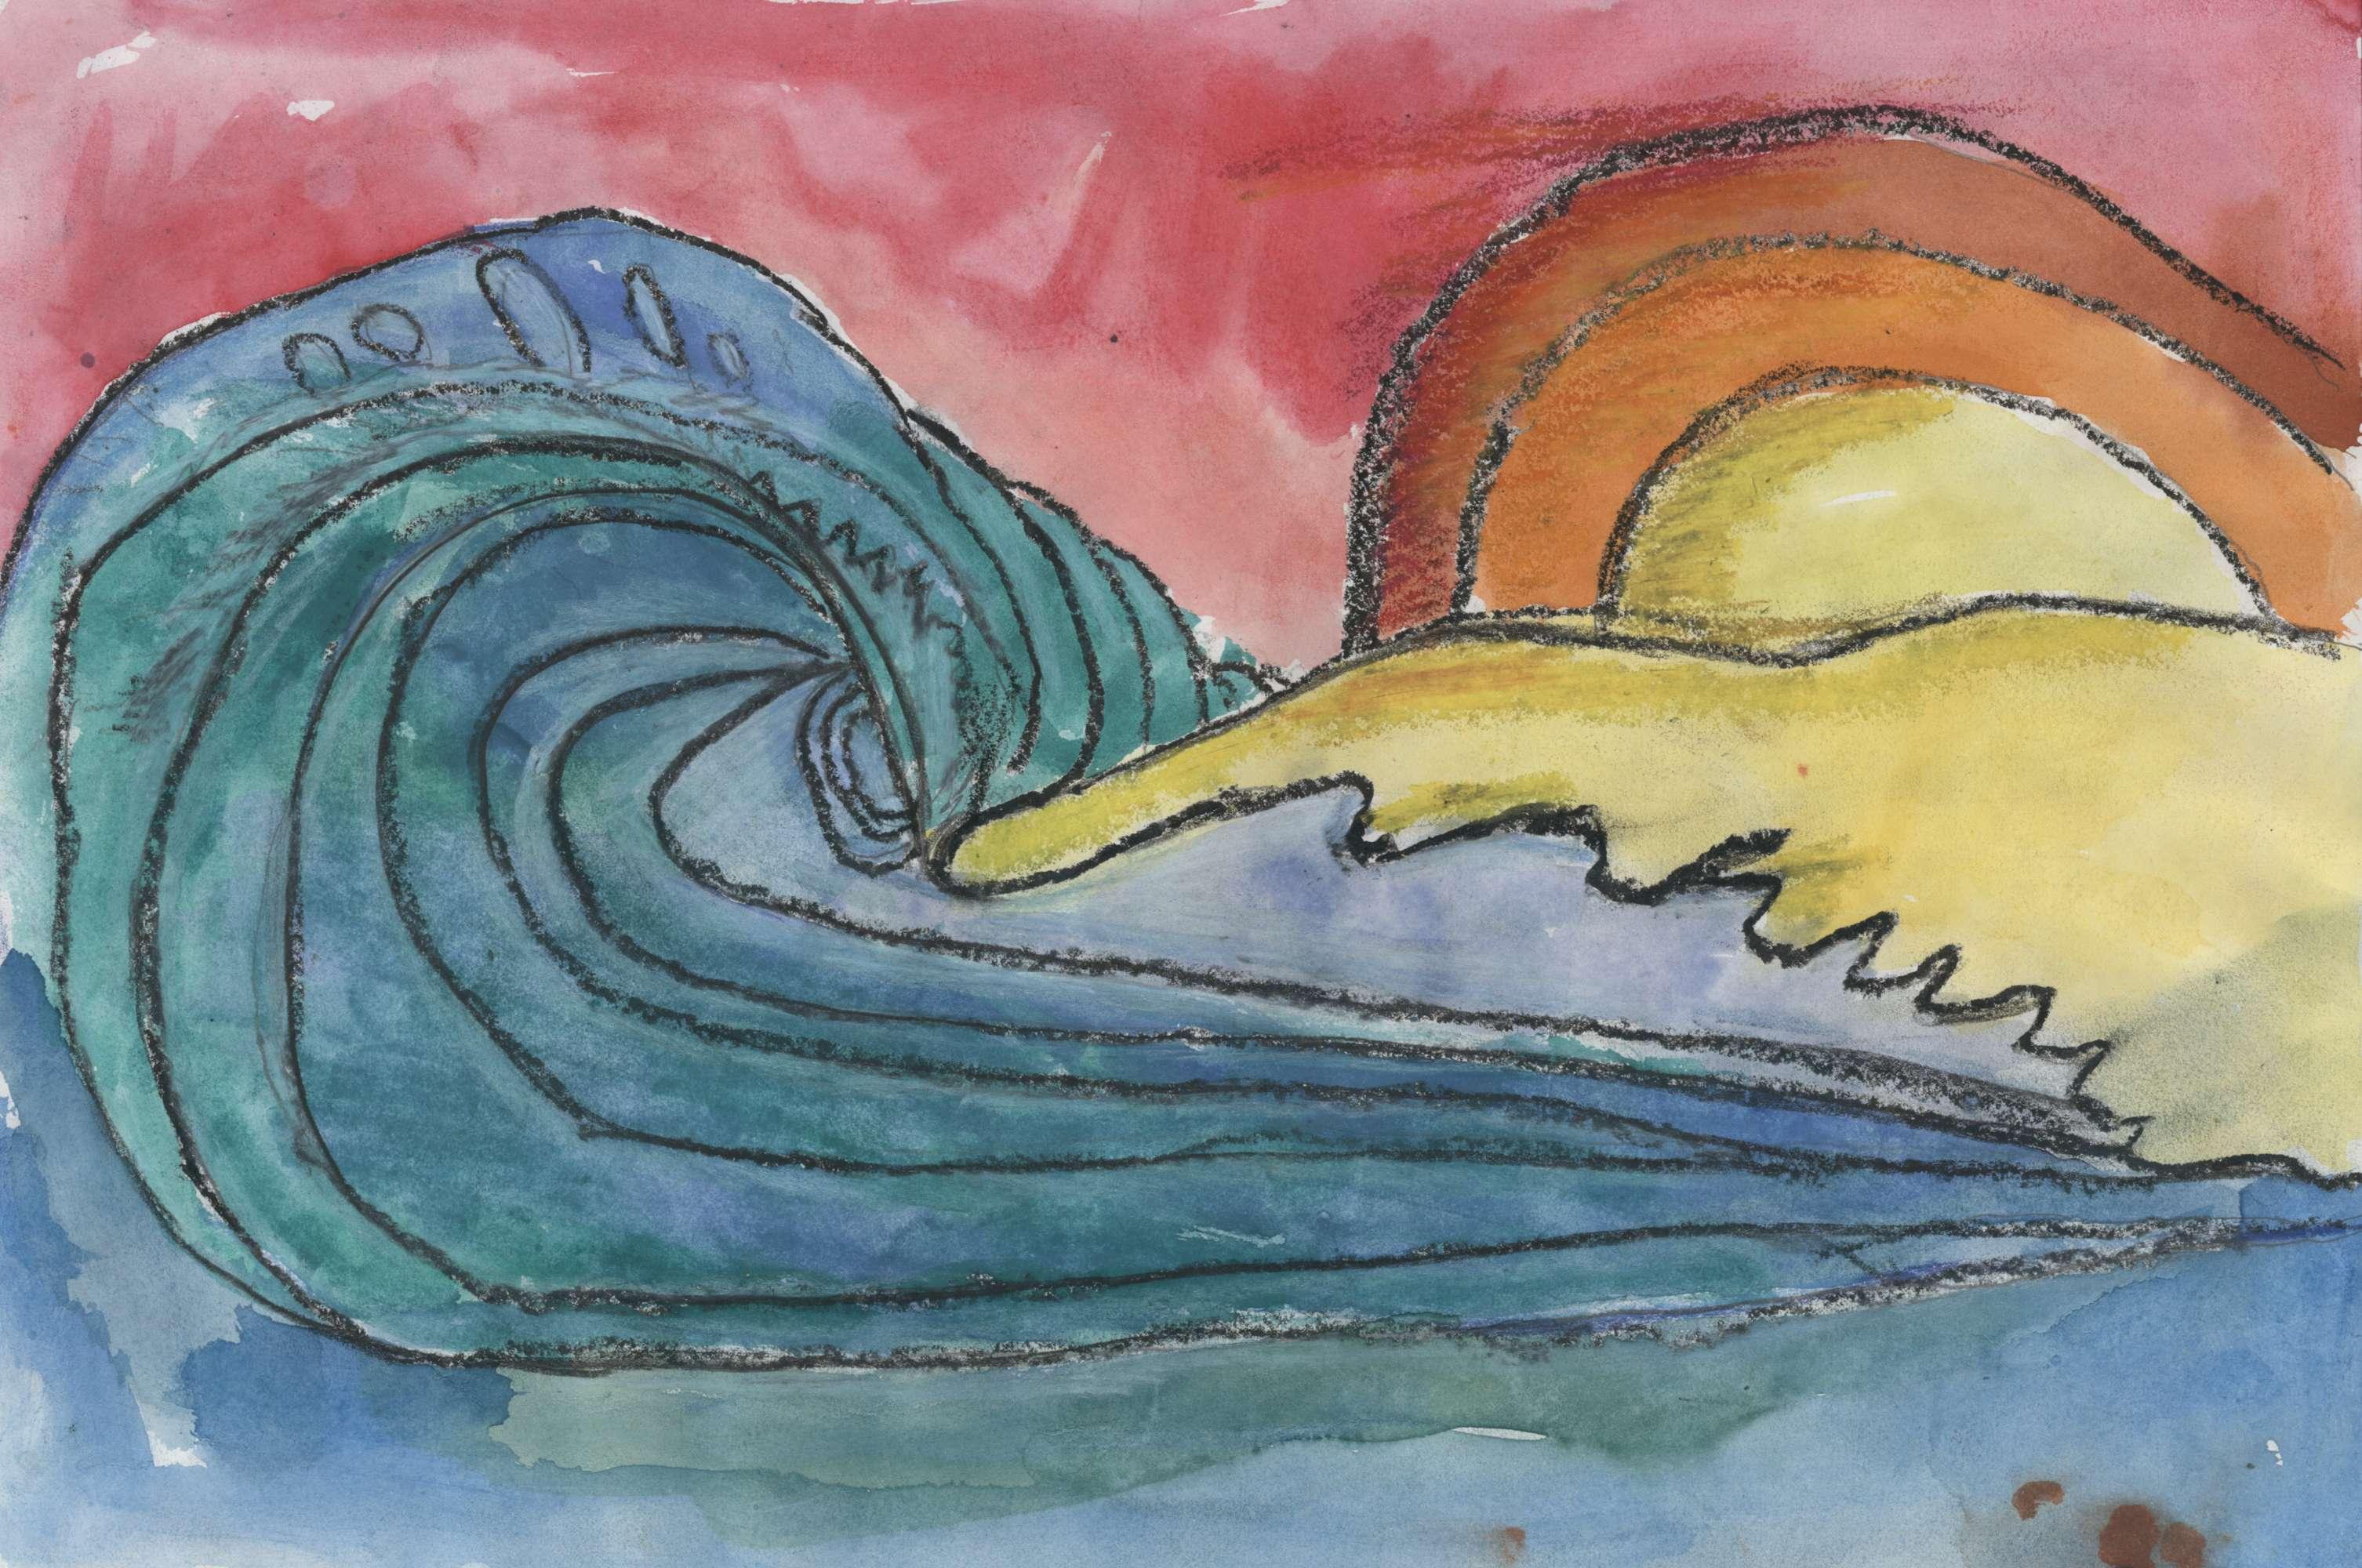 Swell Art 1